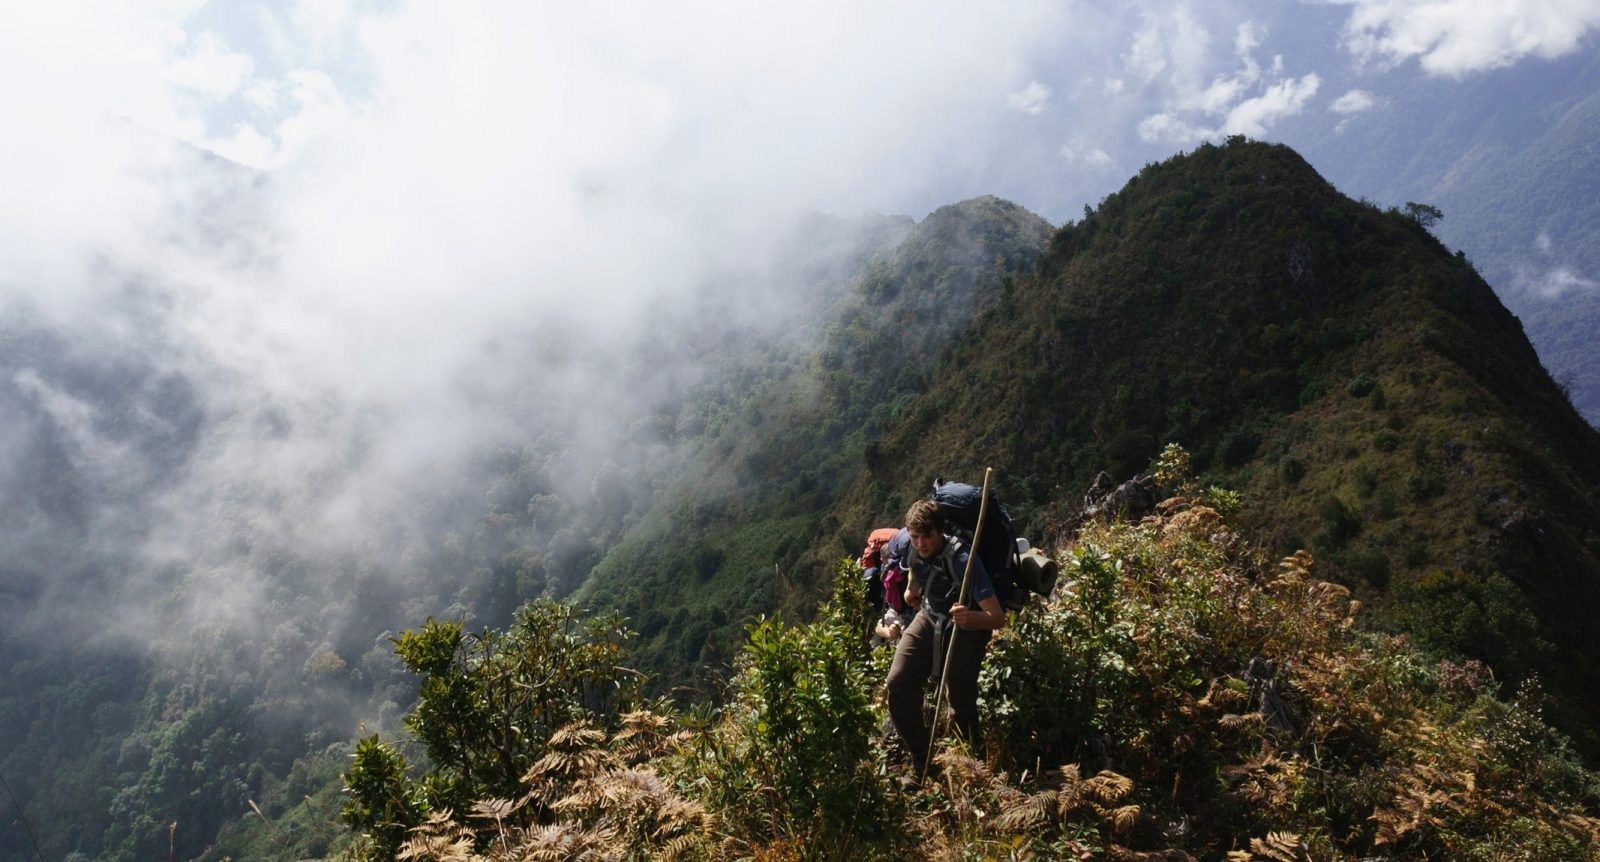 Trekking along a Burmese ridgeline on the way to Mount Saramati